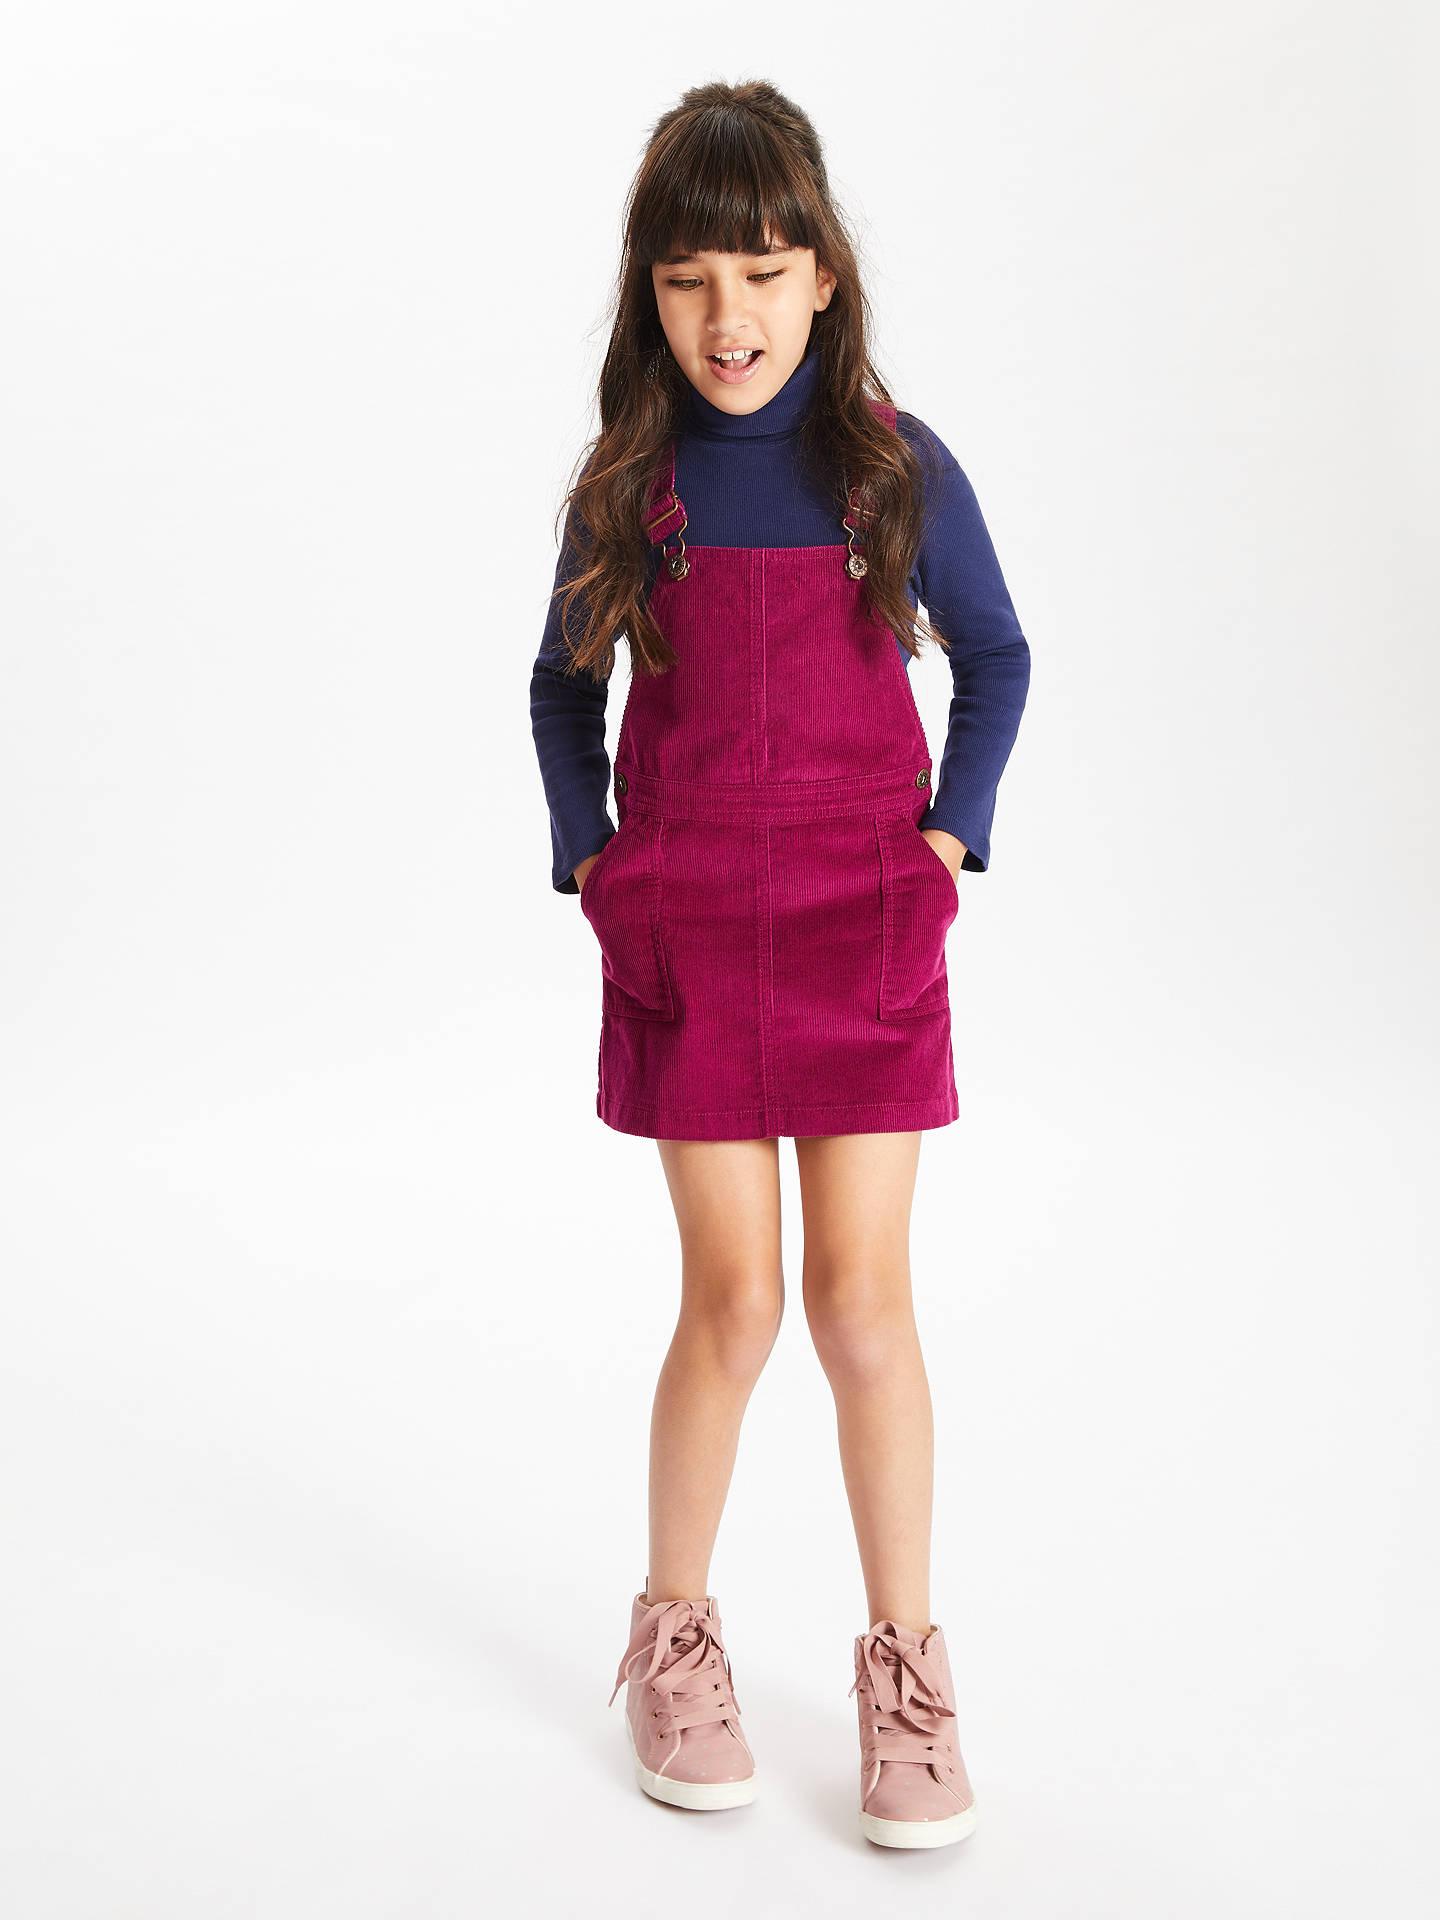 c7b31f8d42da ... Buy John Lewis & Partners Girls' Corduroy Pinafore Dress, Berry, 2  years Online ...